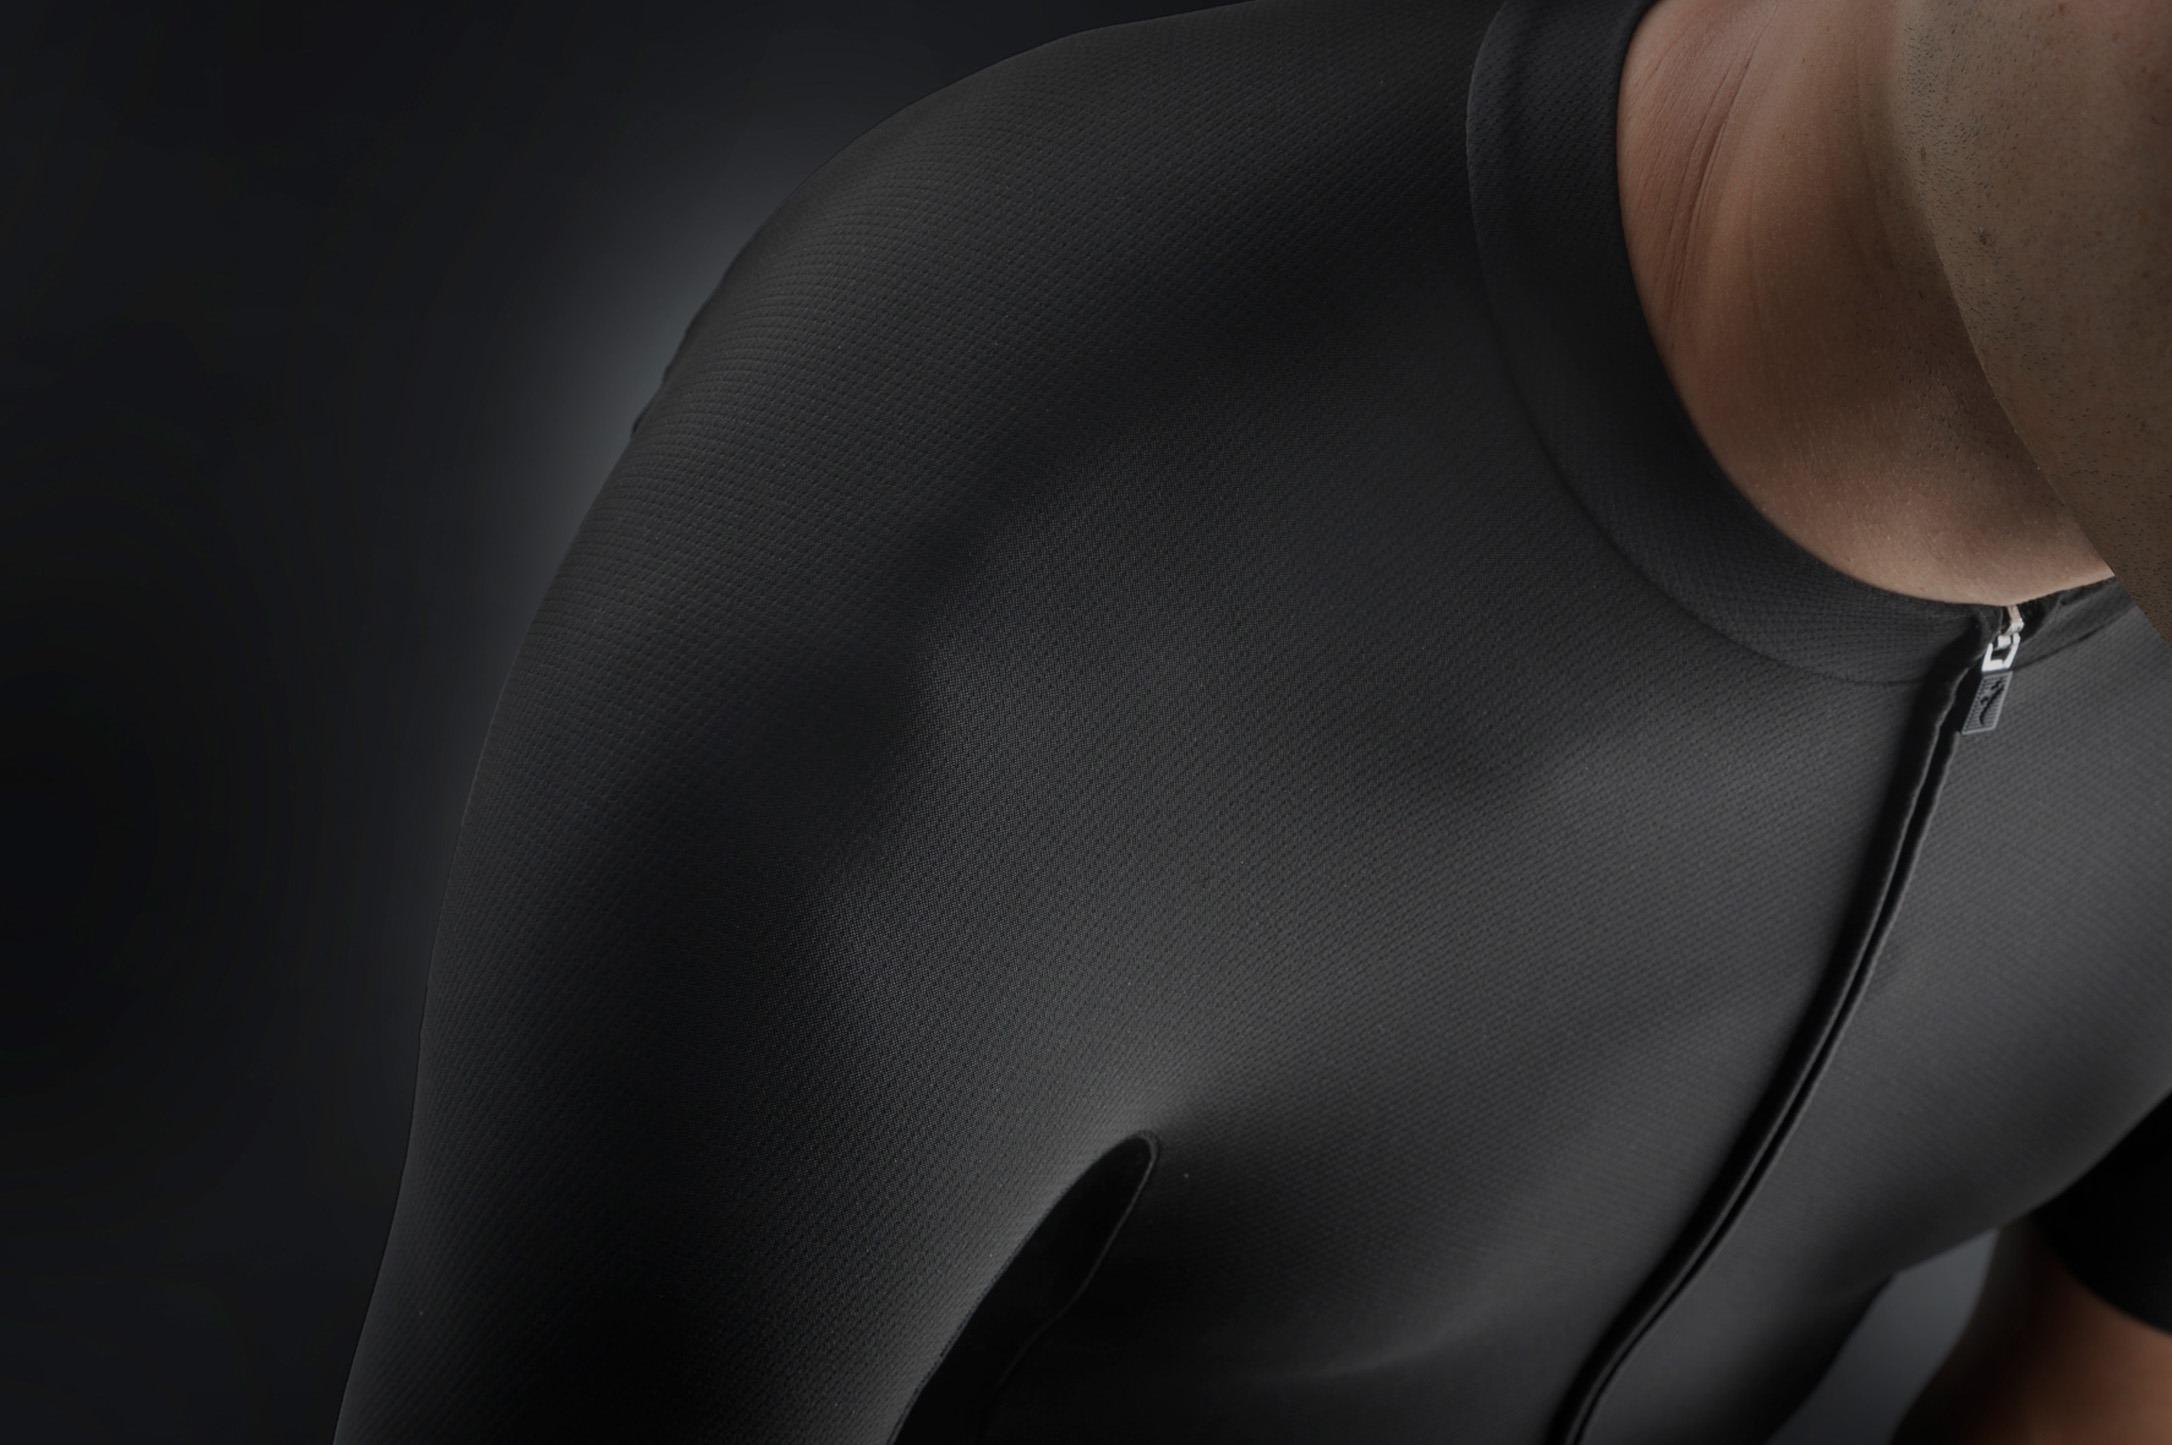 S-Works Evade GC Skinsuit